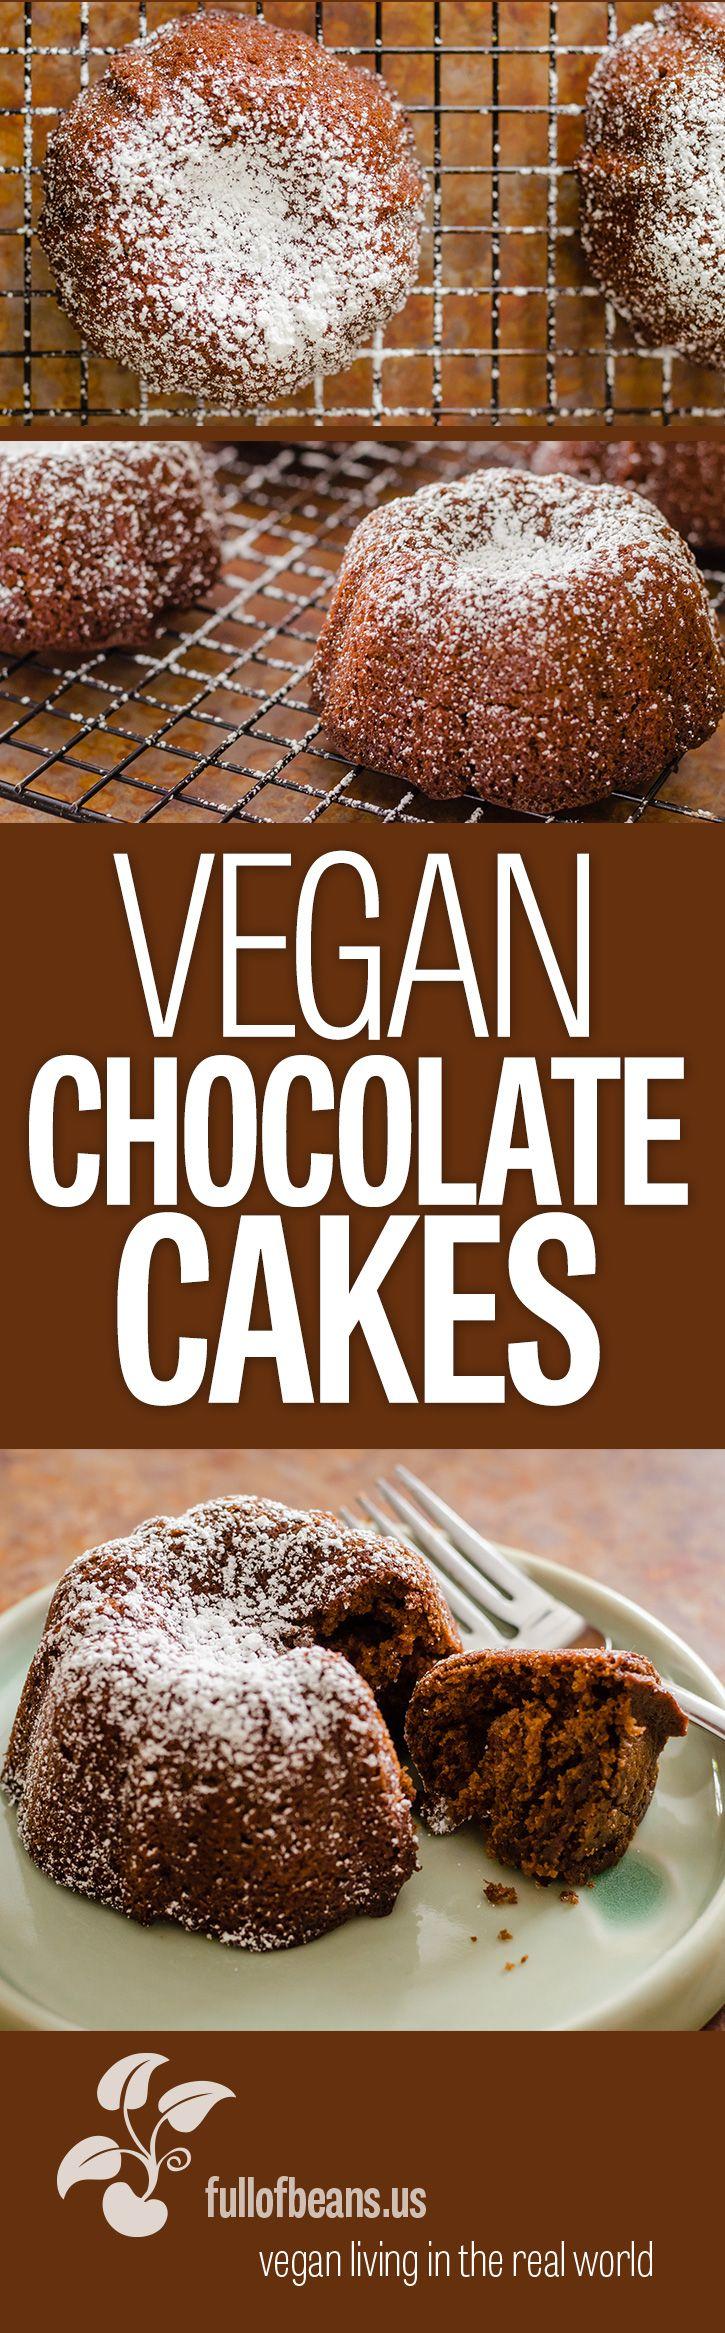 Delicious, super fast, fool proof, chocolate cake. We like them them as mini bundt cakes! #vegan #chocolate